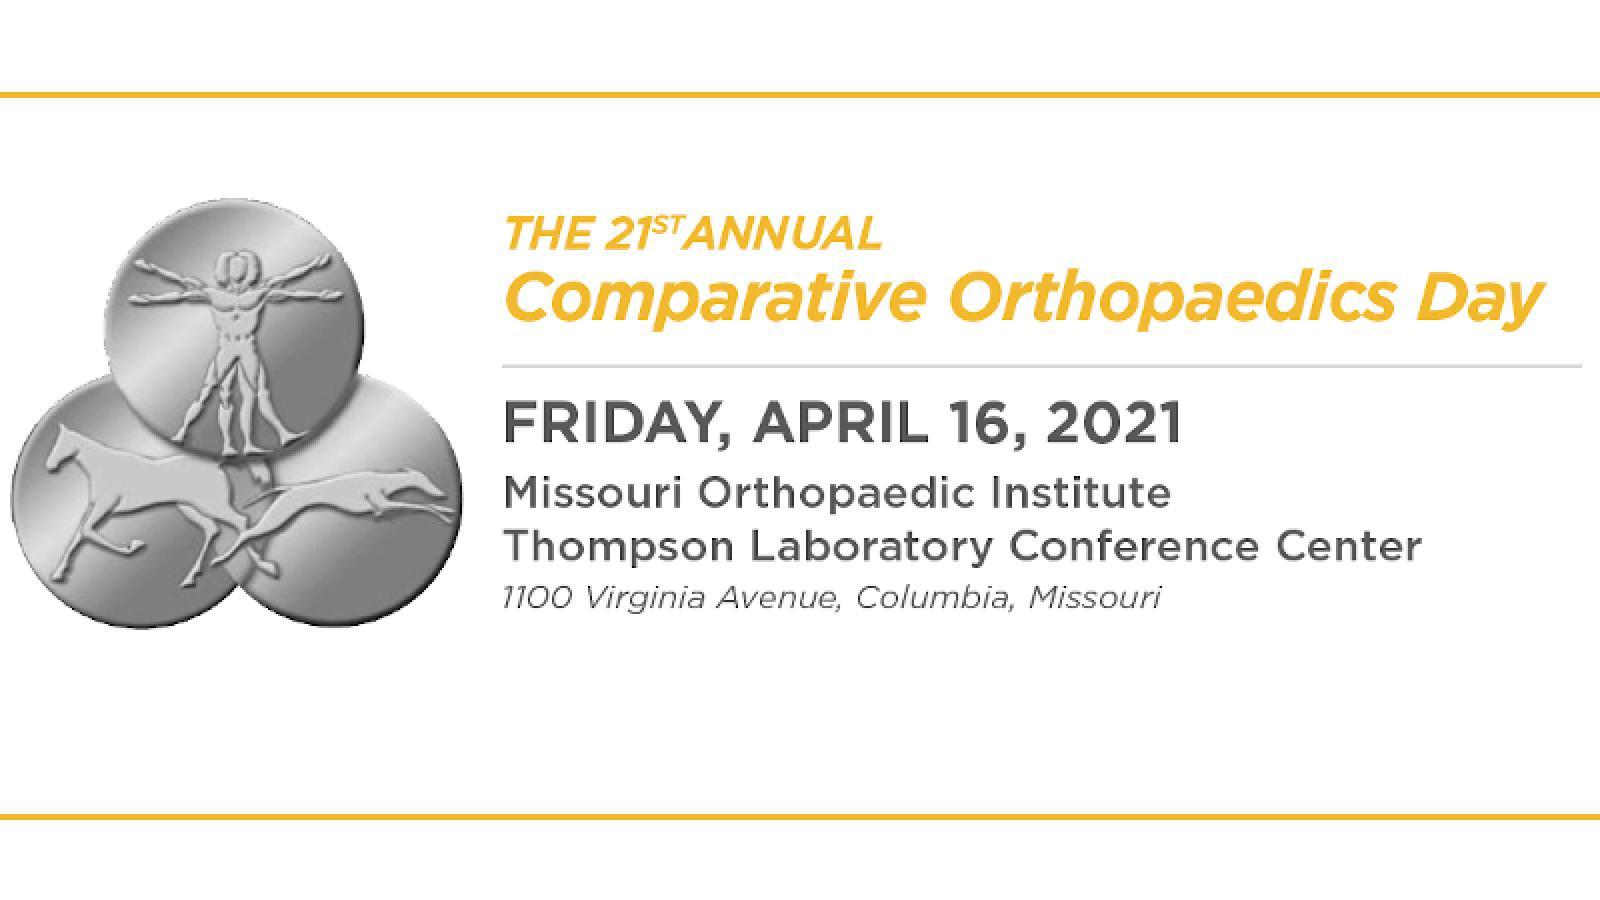 Comparative Orthopaedic sDay